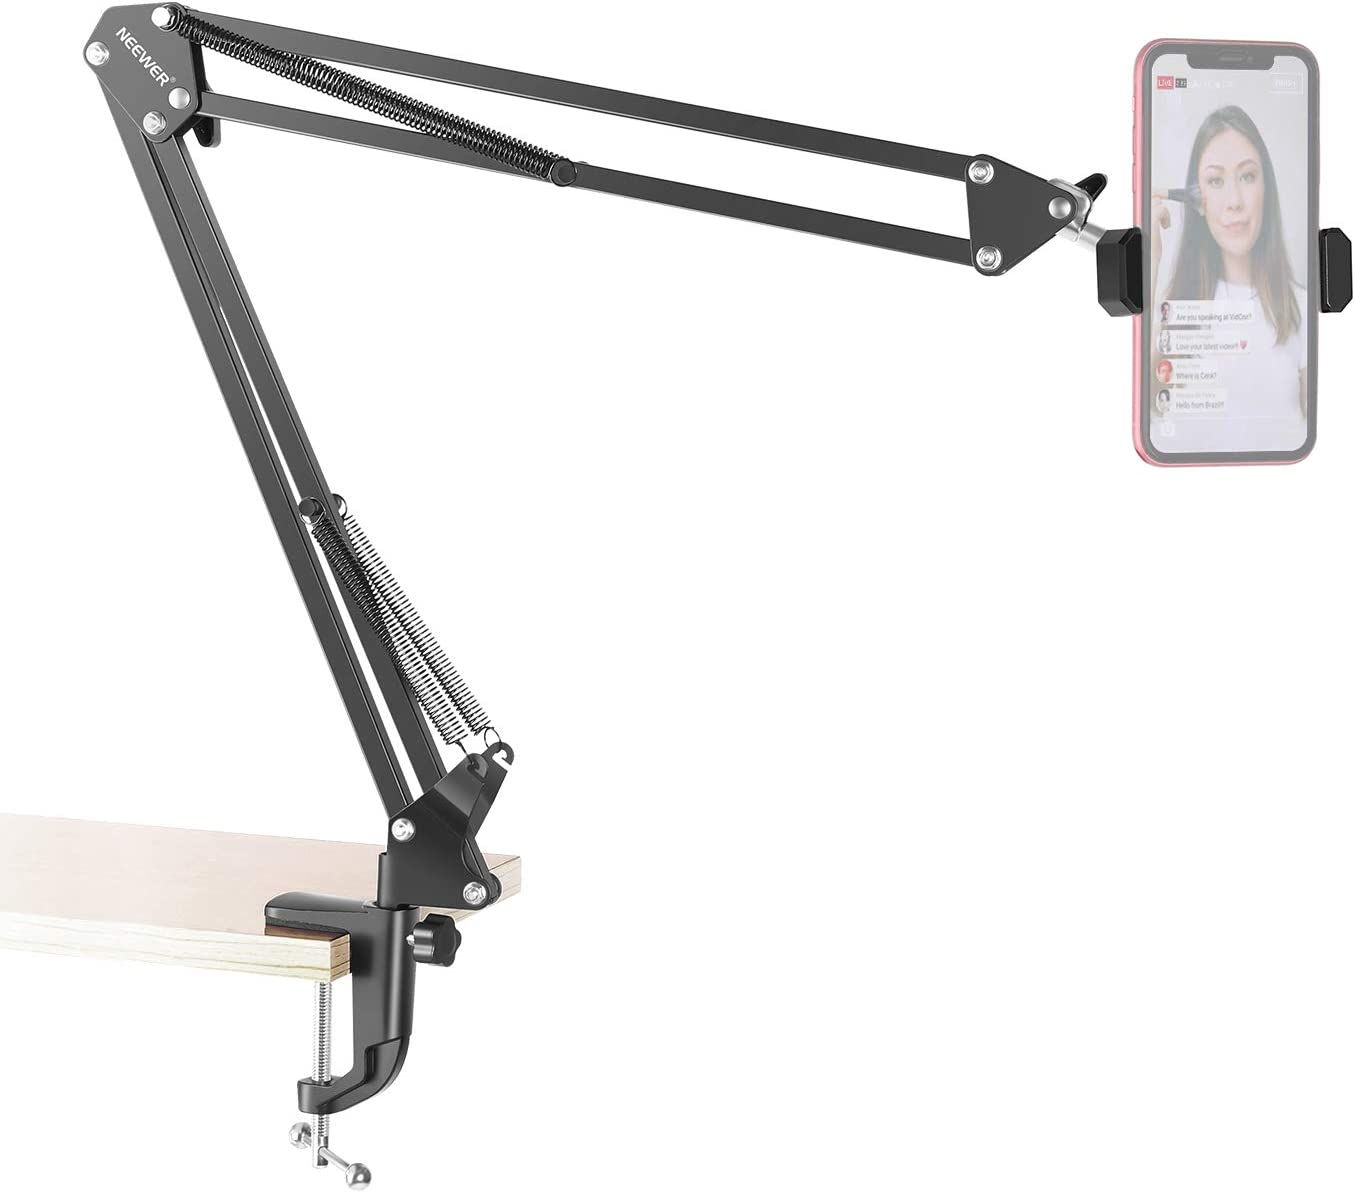 Philadelphia Mall Neewer Table Top Articulating Scissor cheap Stand 360° Rotation Arm